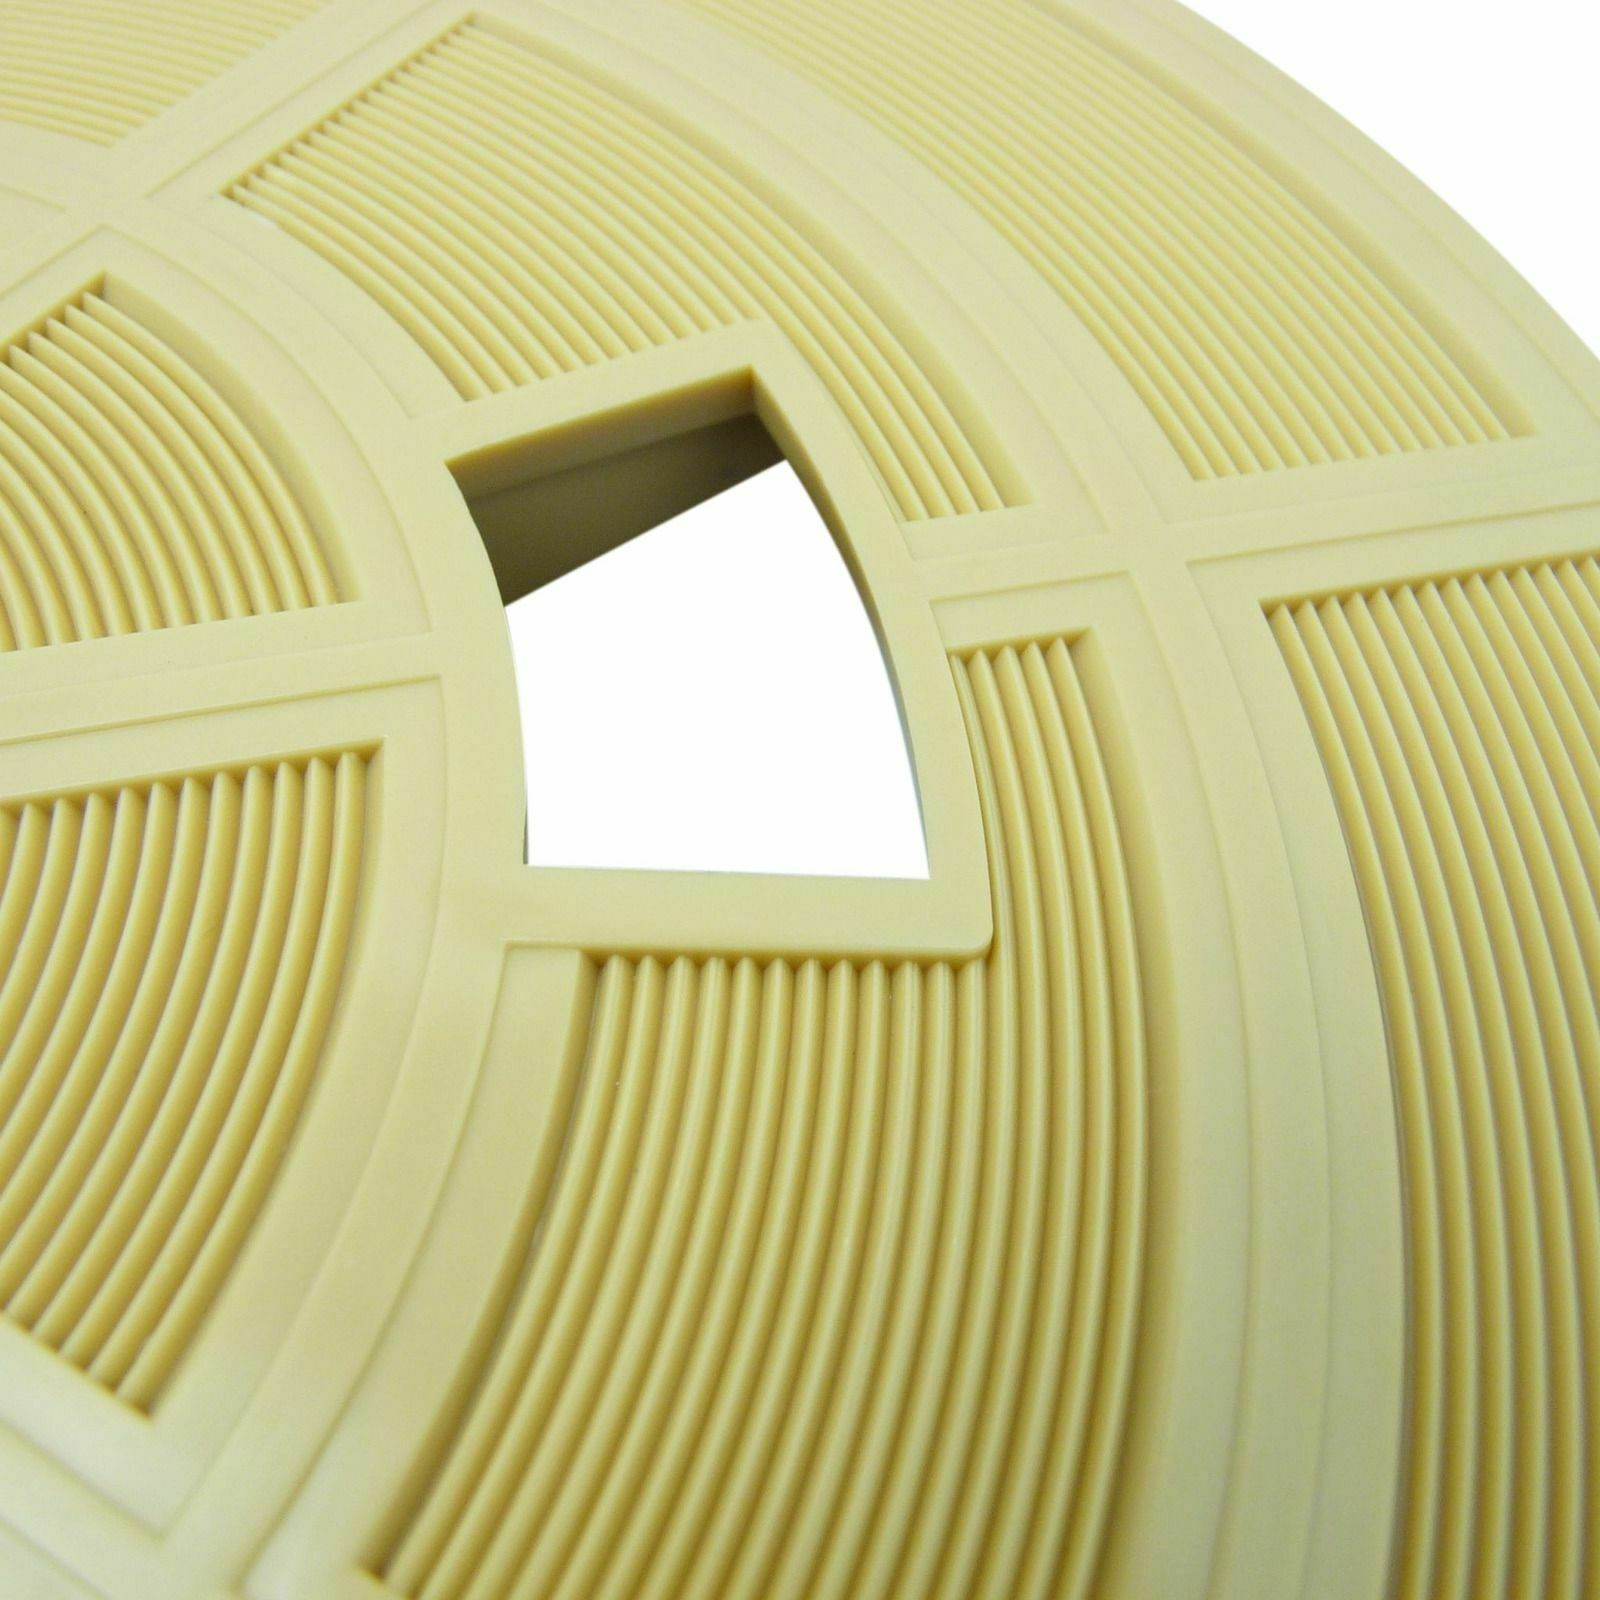 Pool Skimmer Deck Lid Cover Quiptron Filtrite SK900 SK950 Beige Brown Colour